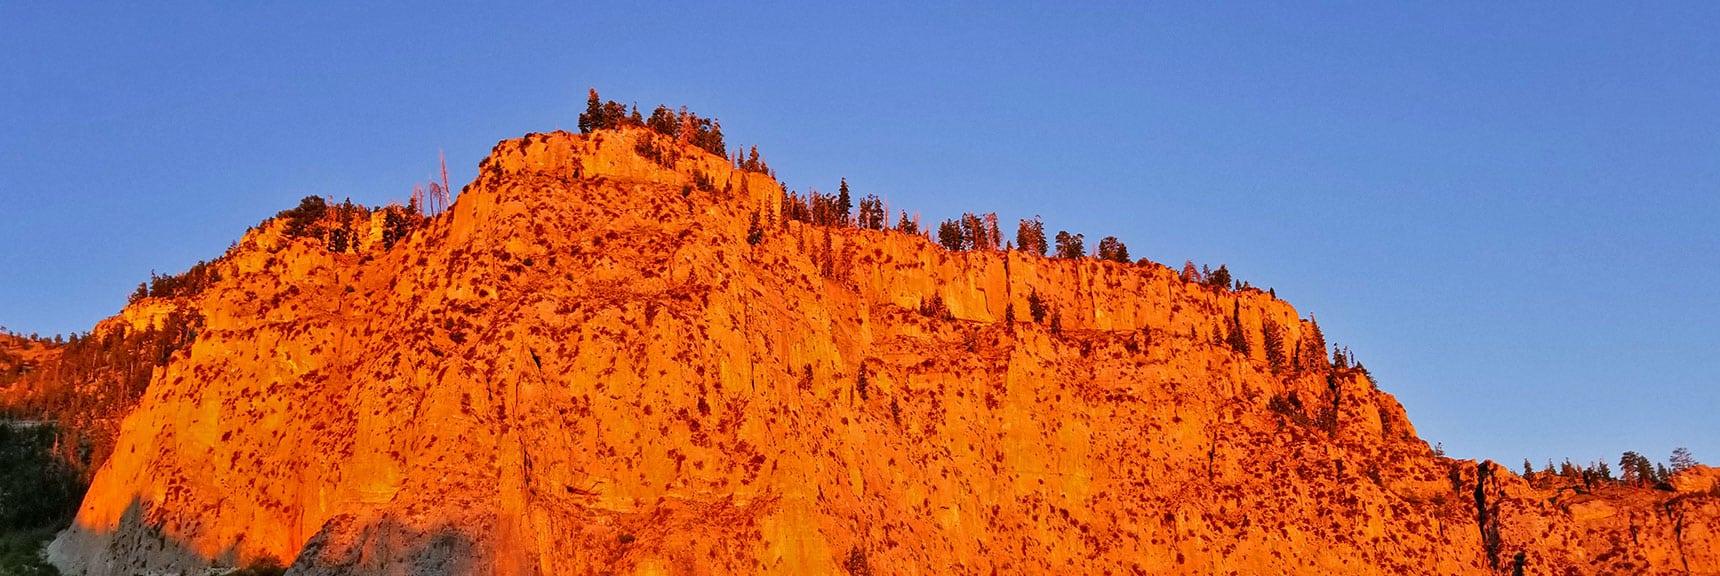 First Viewpoint Cliff on South Climb Trail | Griffith Peak & Charleston Peak Circuit Run, Spring Mountains, Nevada